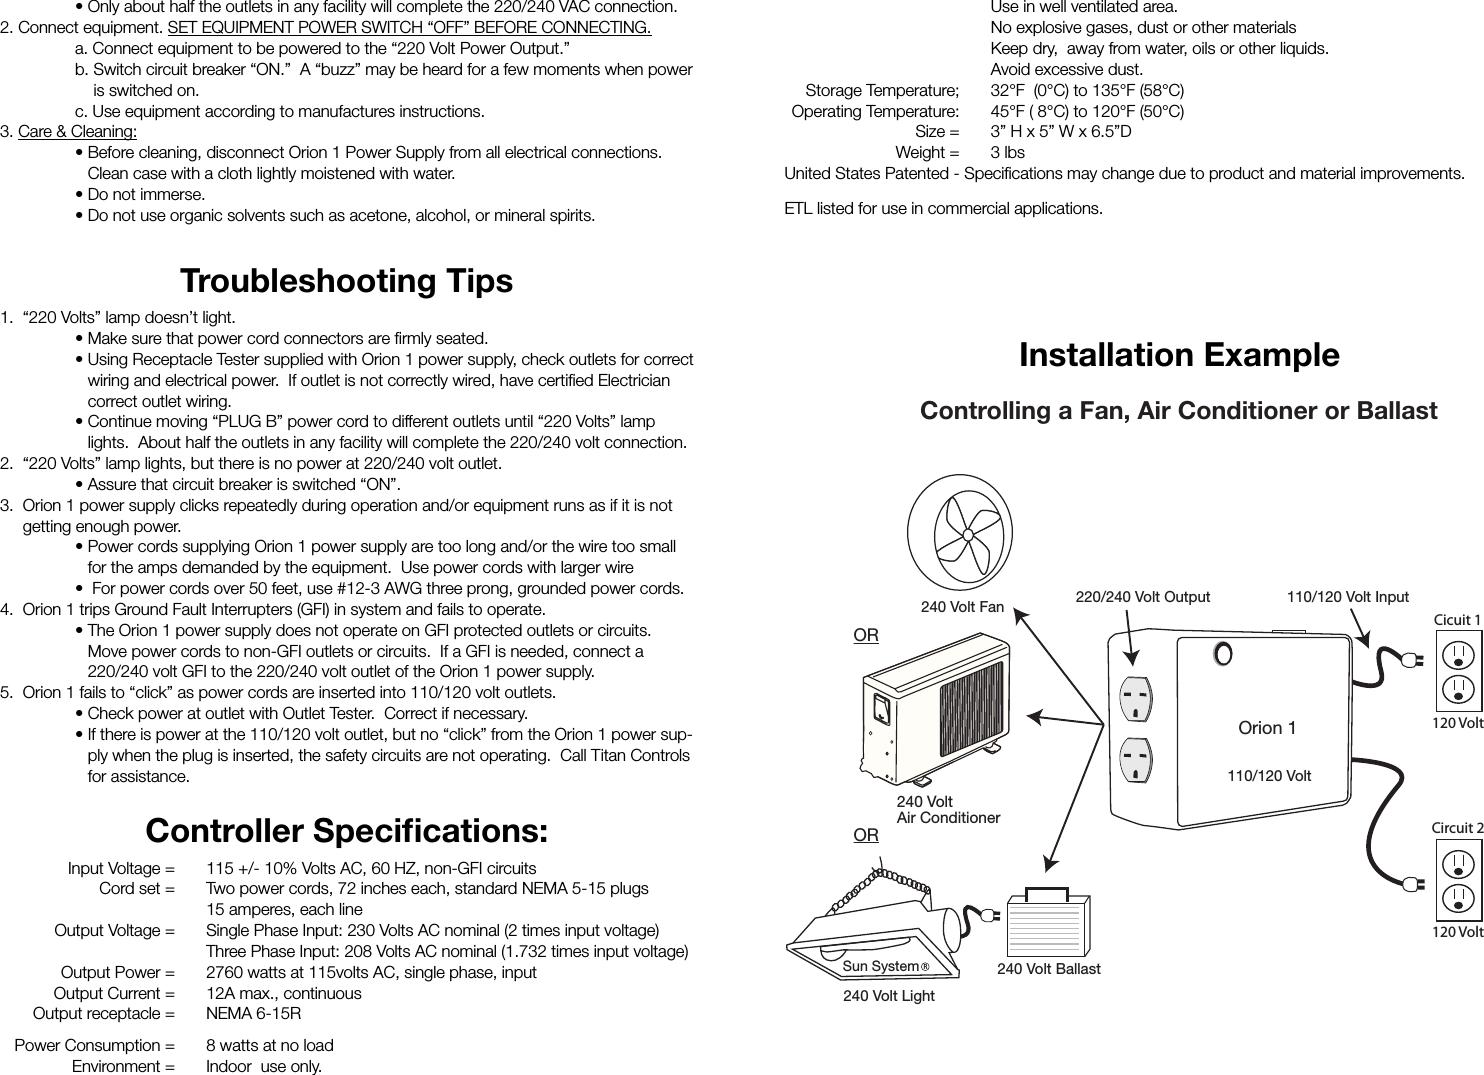 702795 Instructions